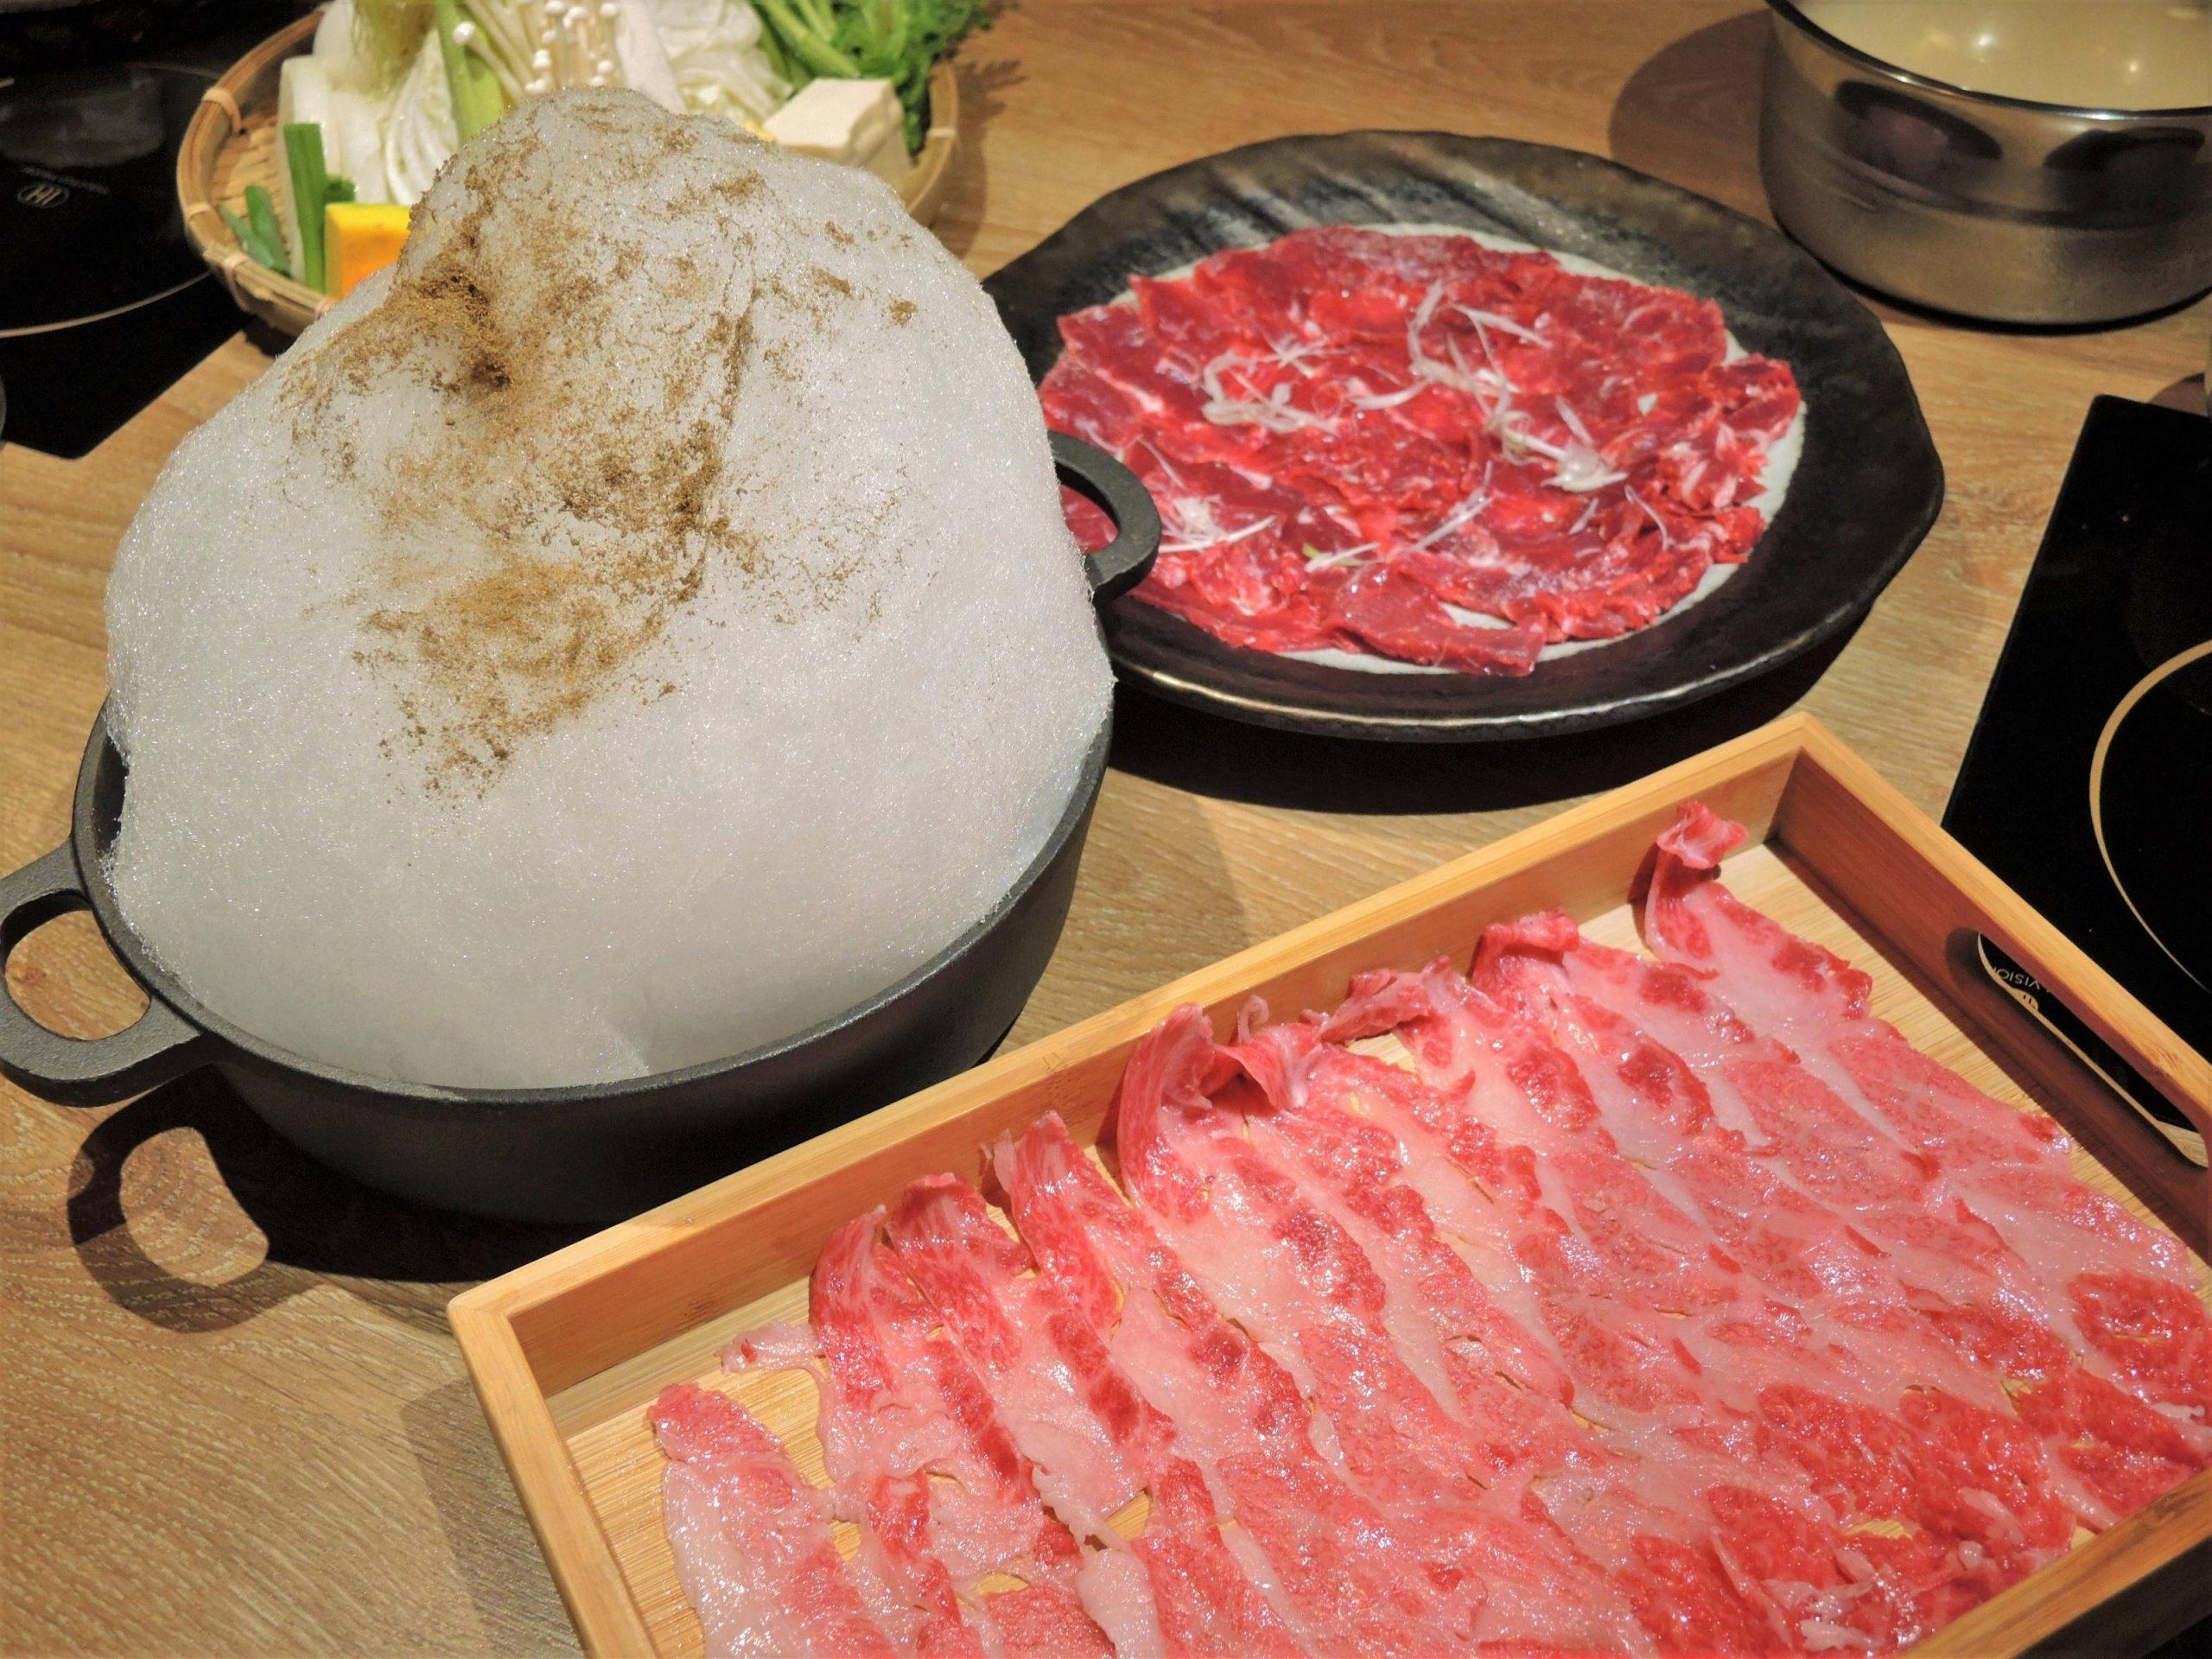 Power Beef 冷藏肉涮涮鍋